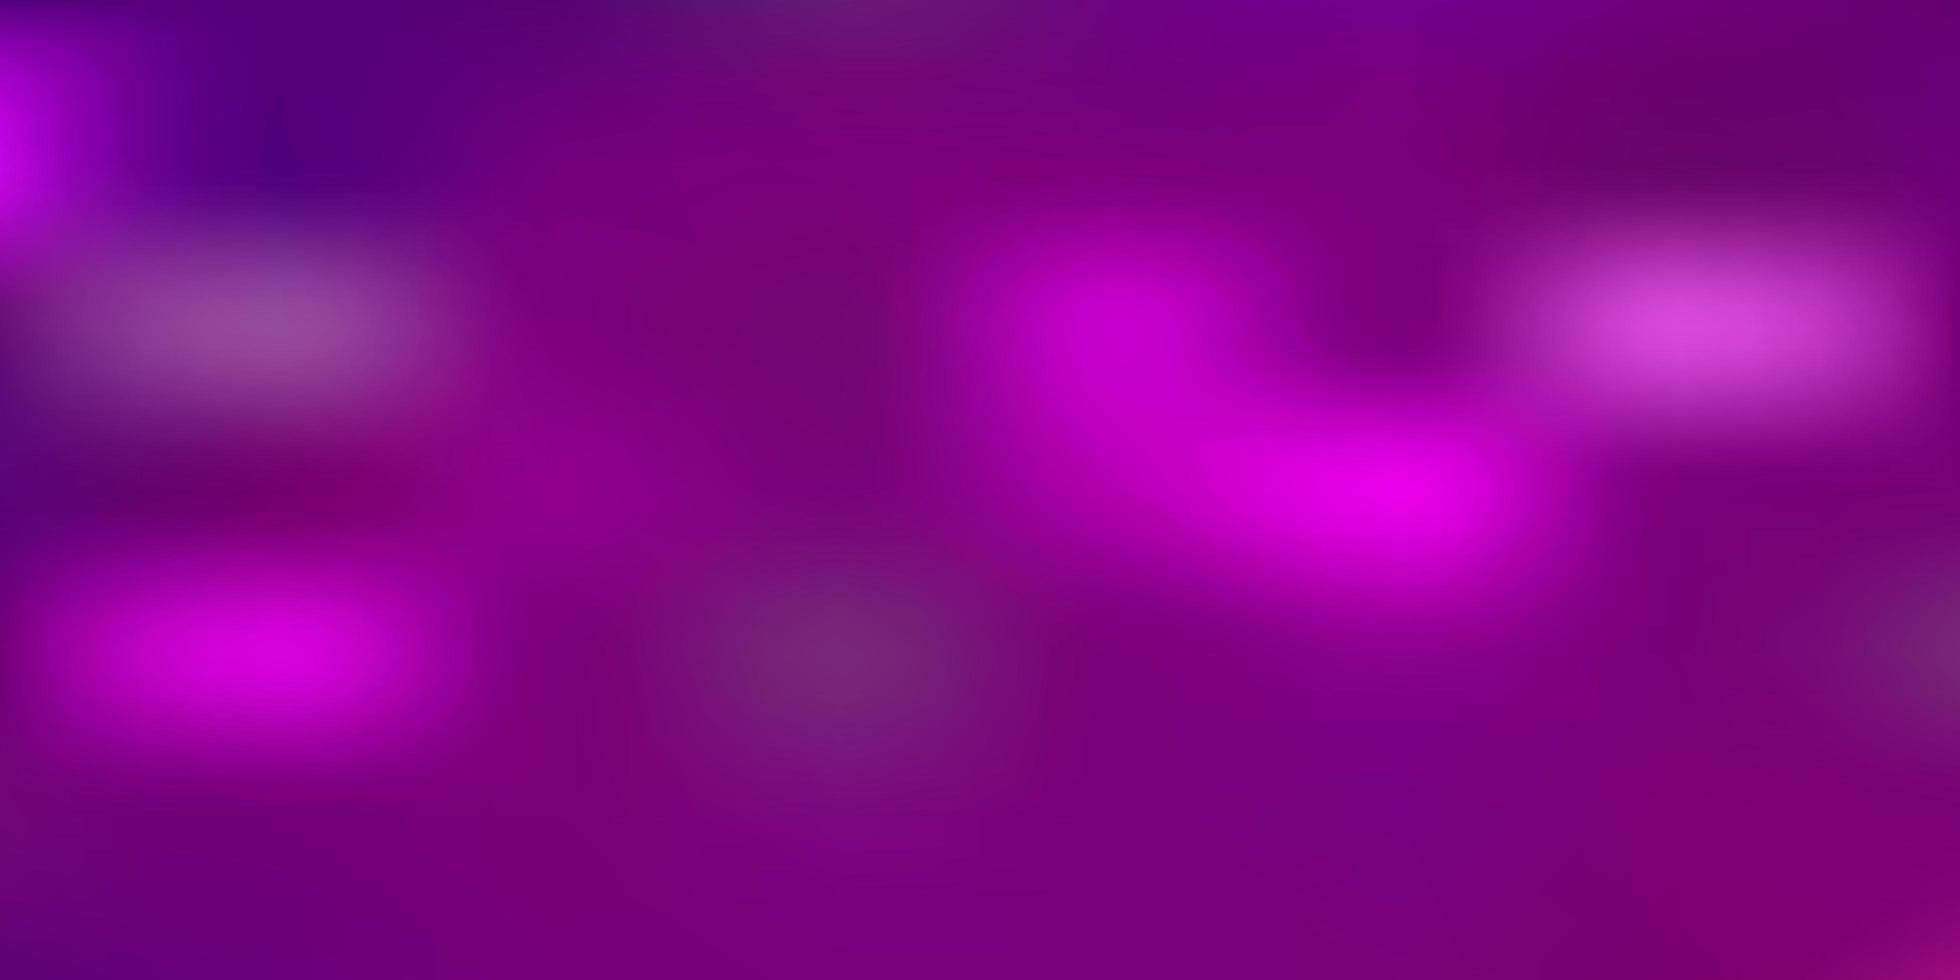 hellvioletter, rosa Vektorunschärfehintergrund. vektor